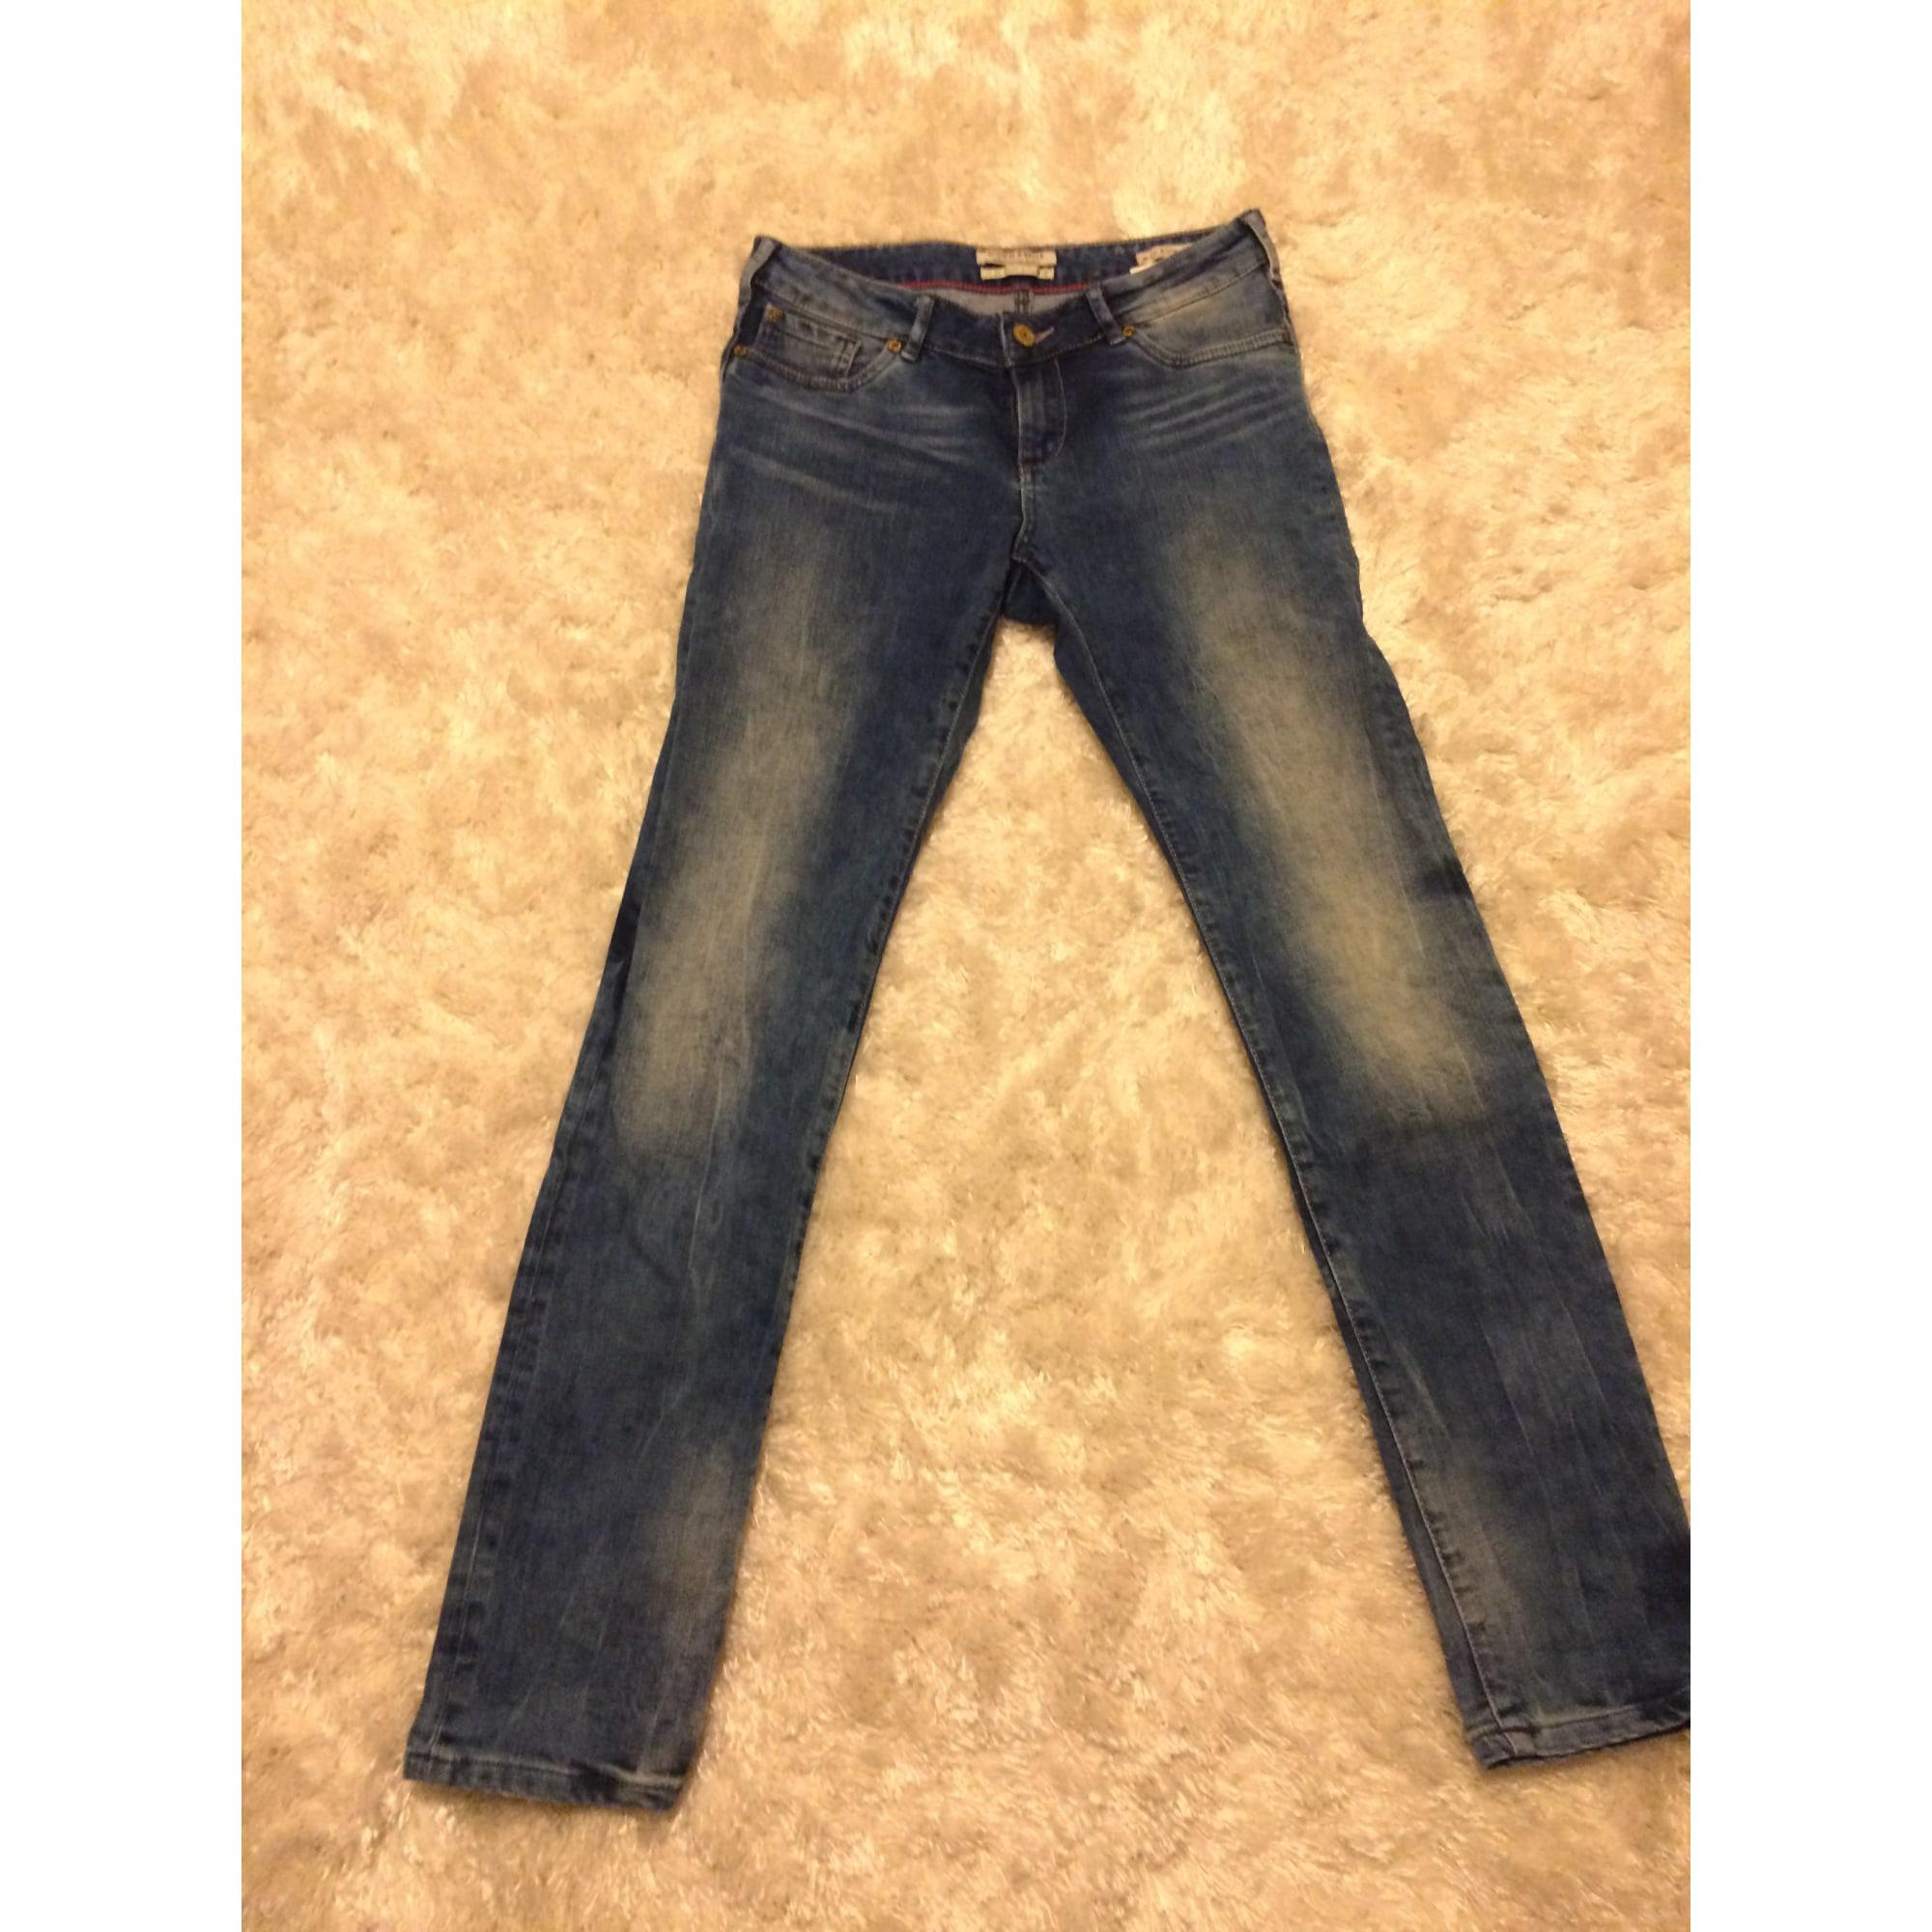 Jeans droit SCOTCH R'BELLE Bleu, bleu marine, bleu turquoise